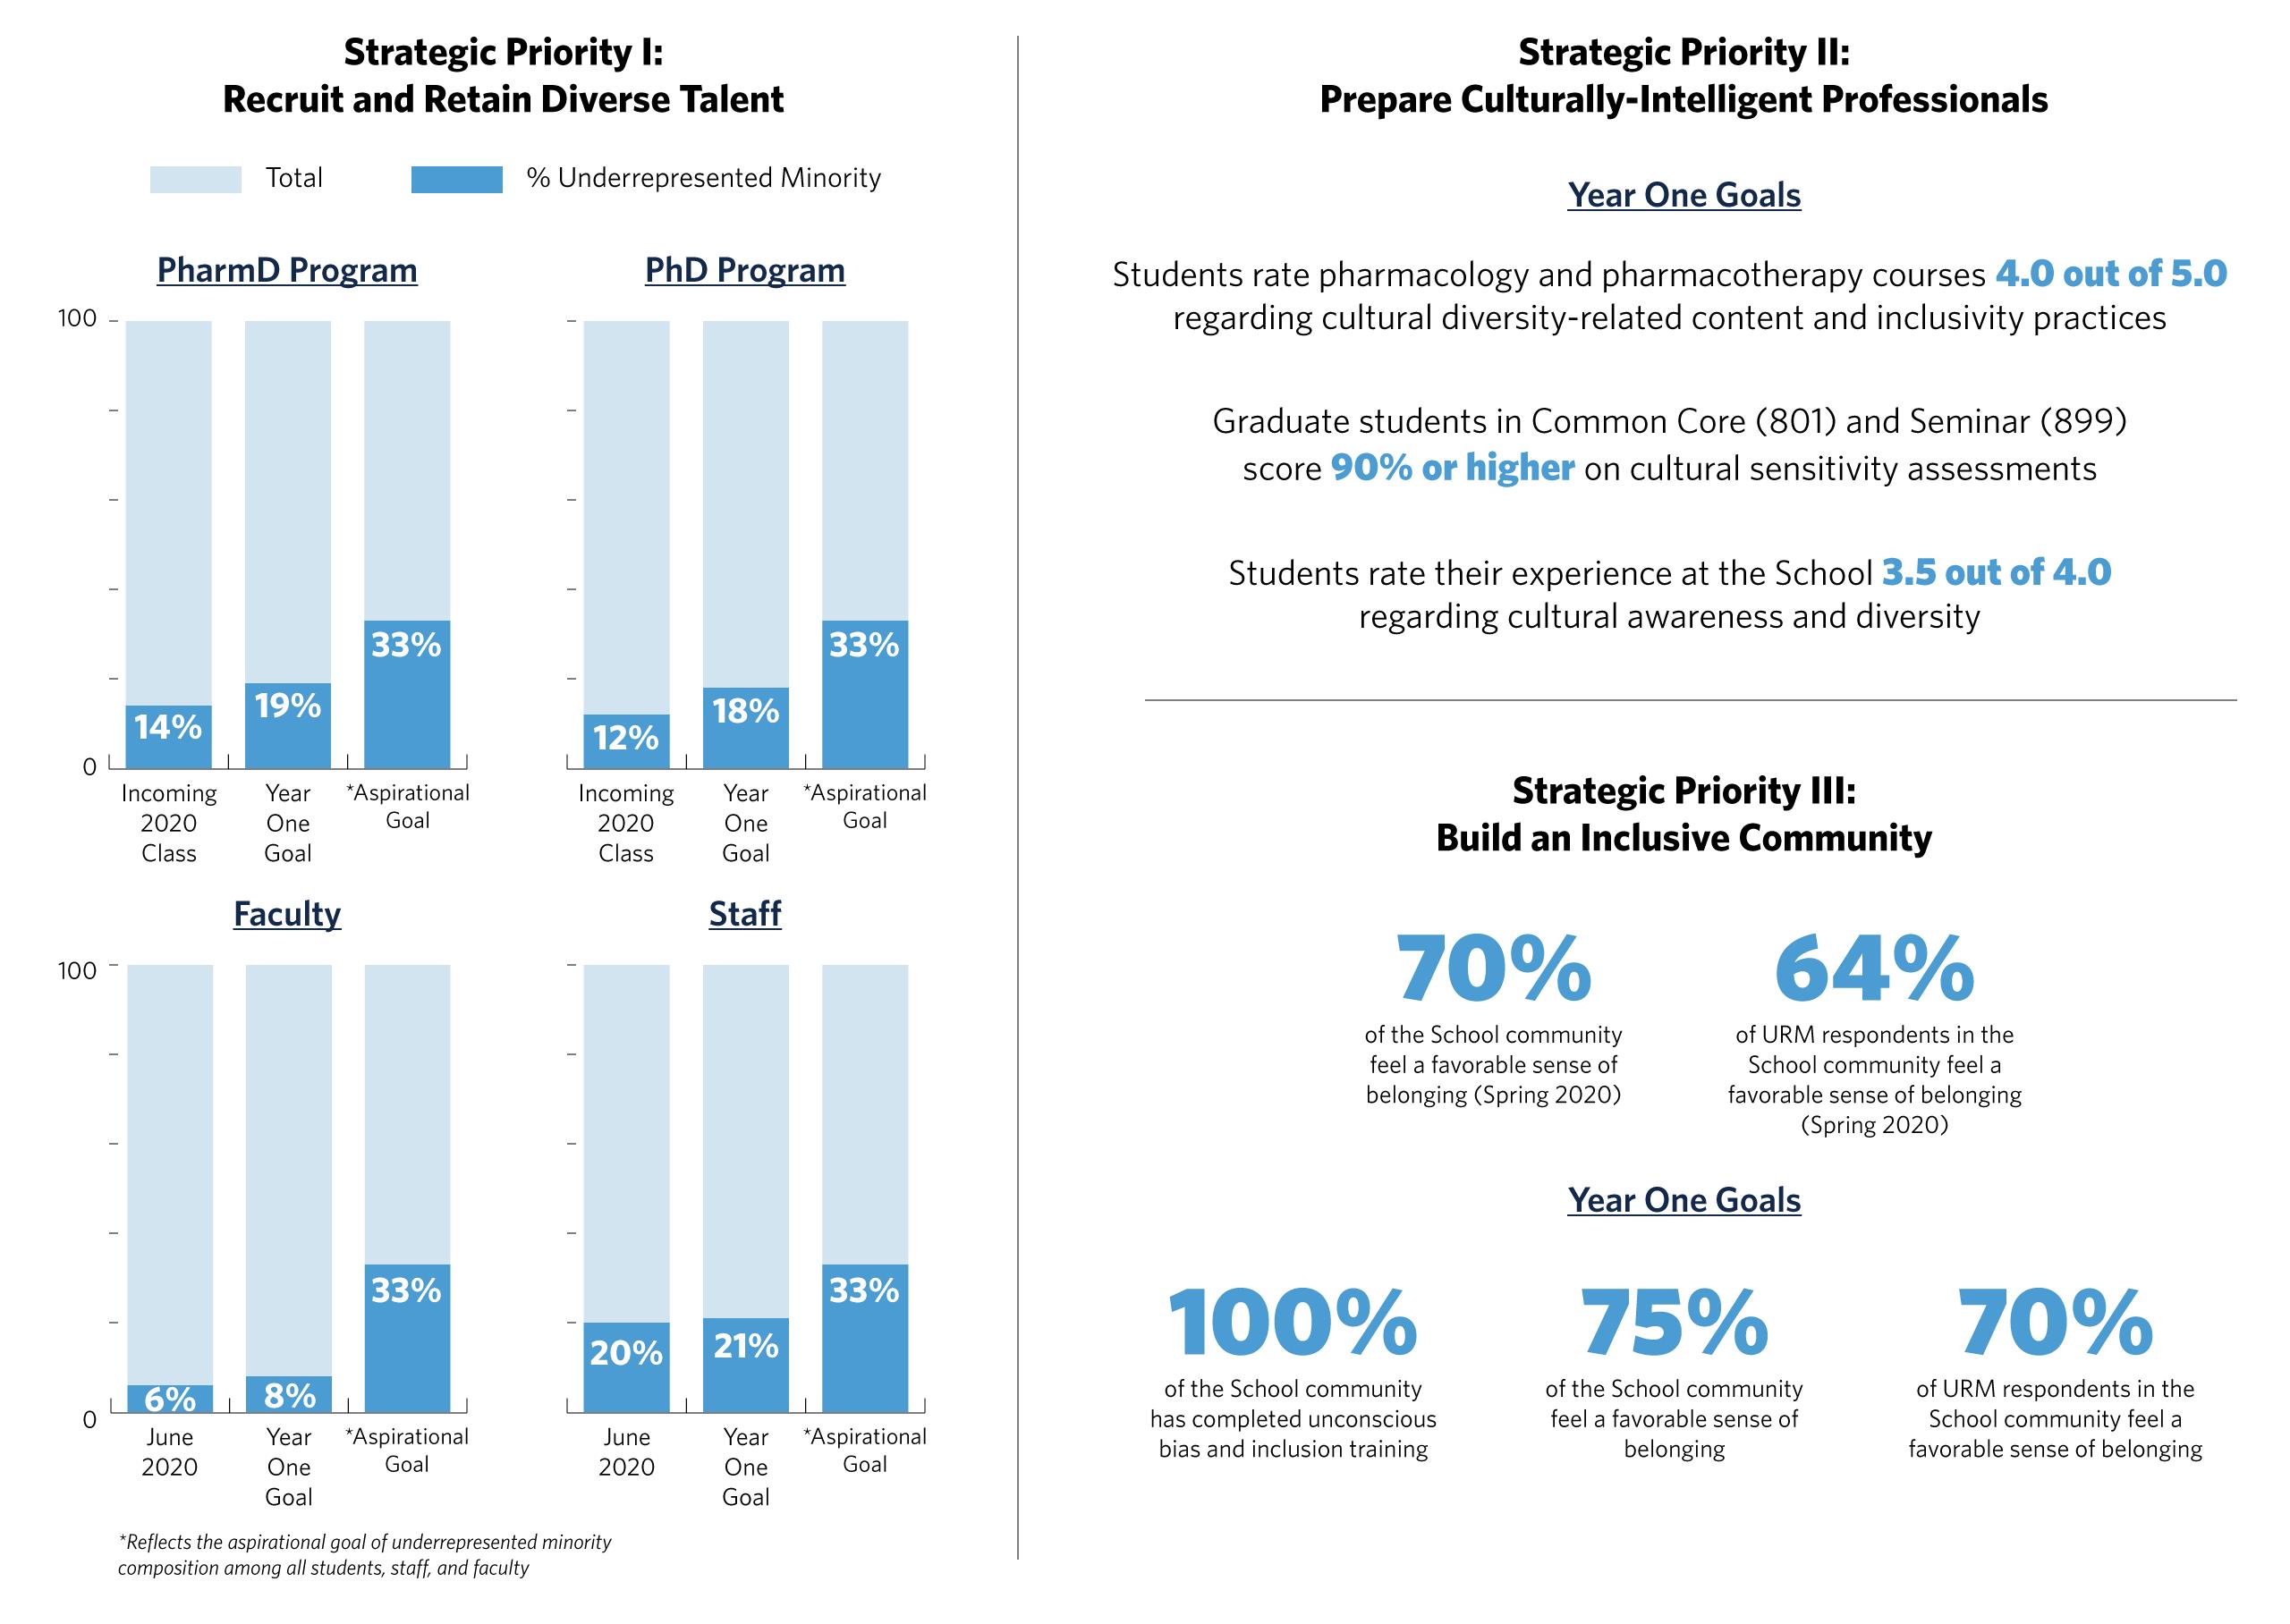 ODI_Strategic_Priorities